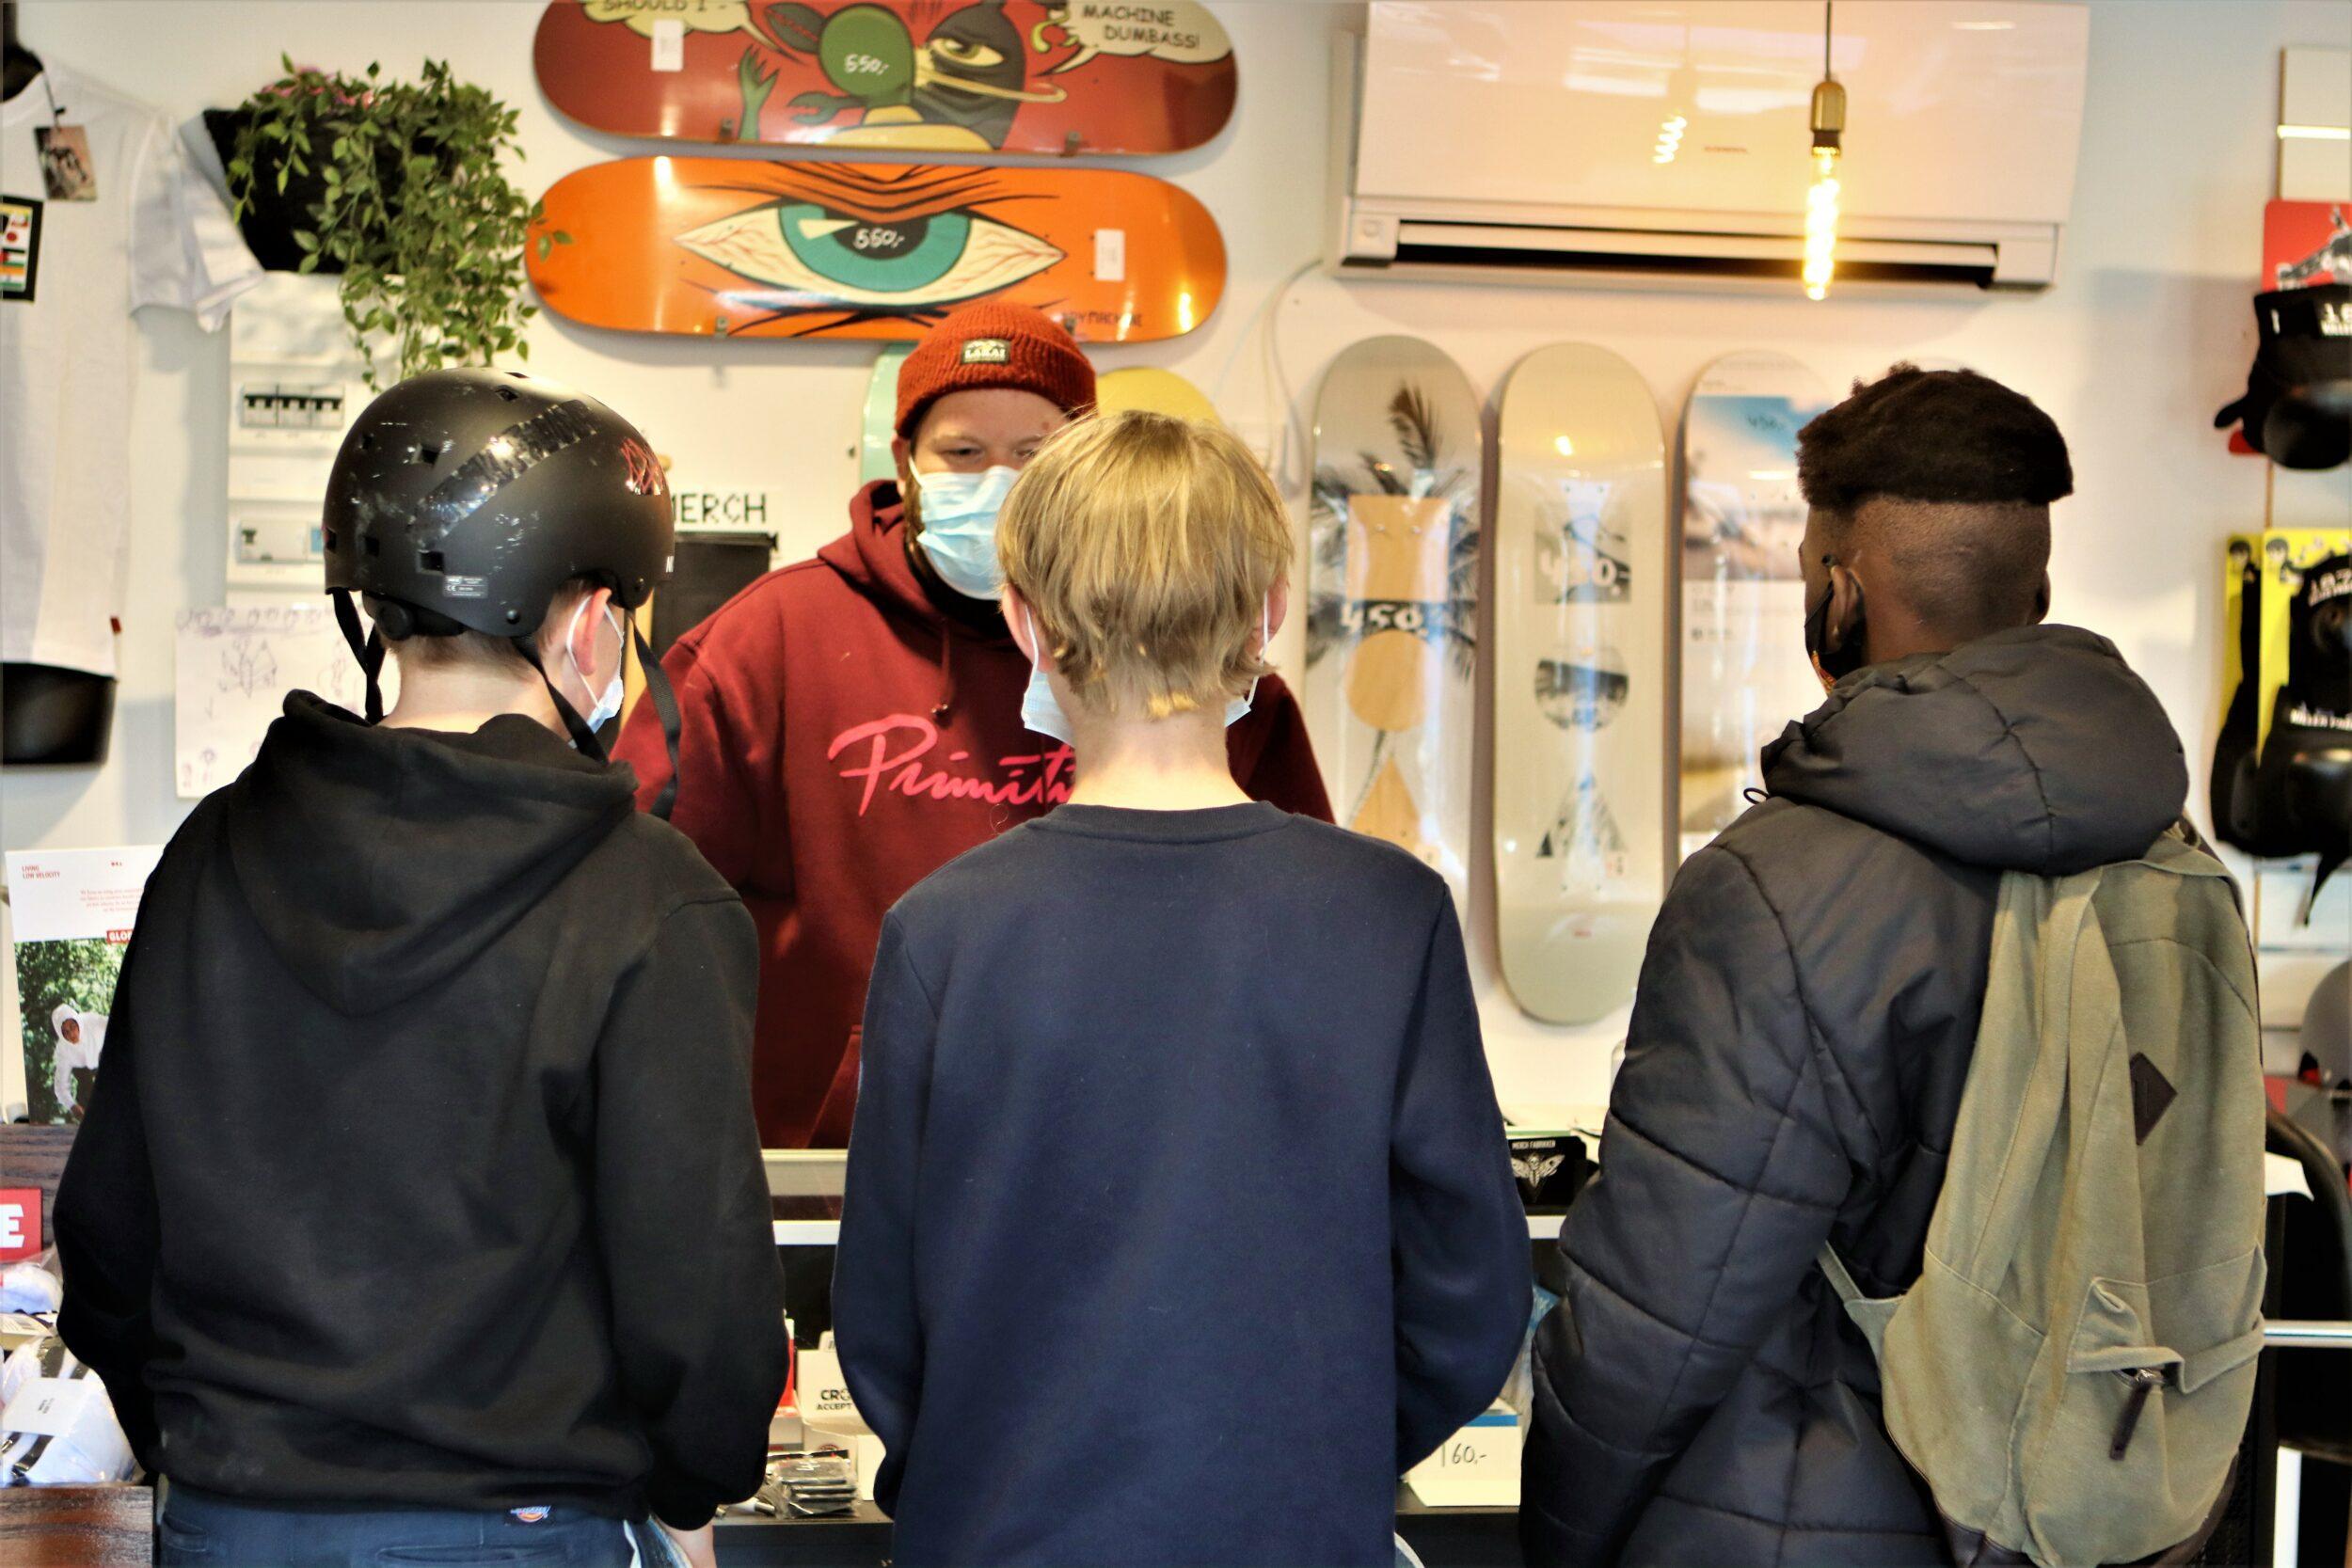 Skateboards, band-merchandise og fede hoodies